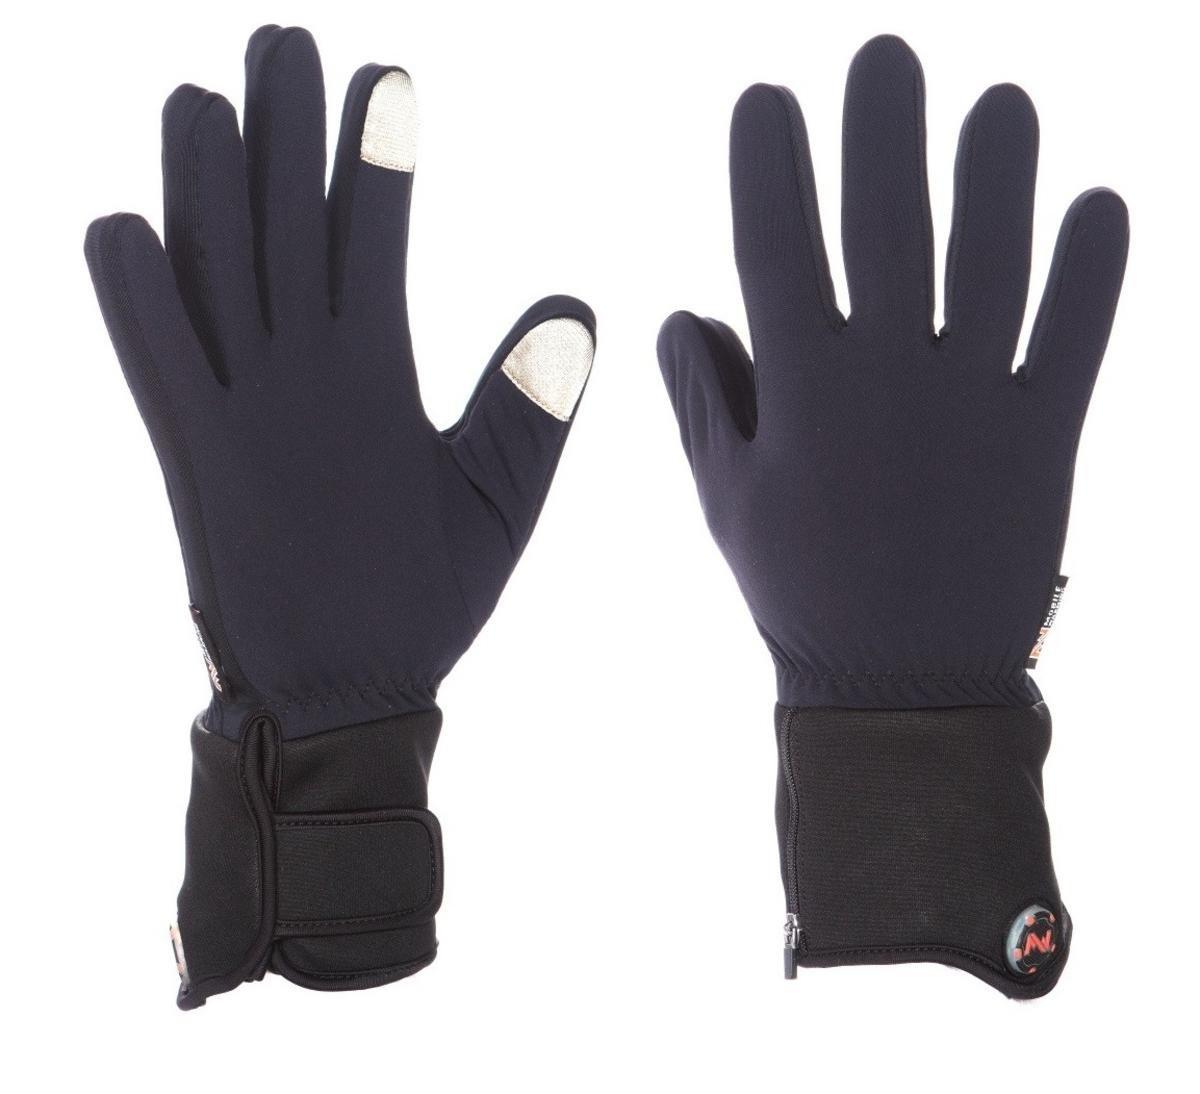 Mobile Warming Unisex-Adult Heated 7.4v Gloves Liner (Black, Small)